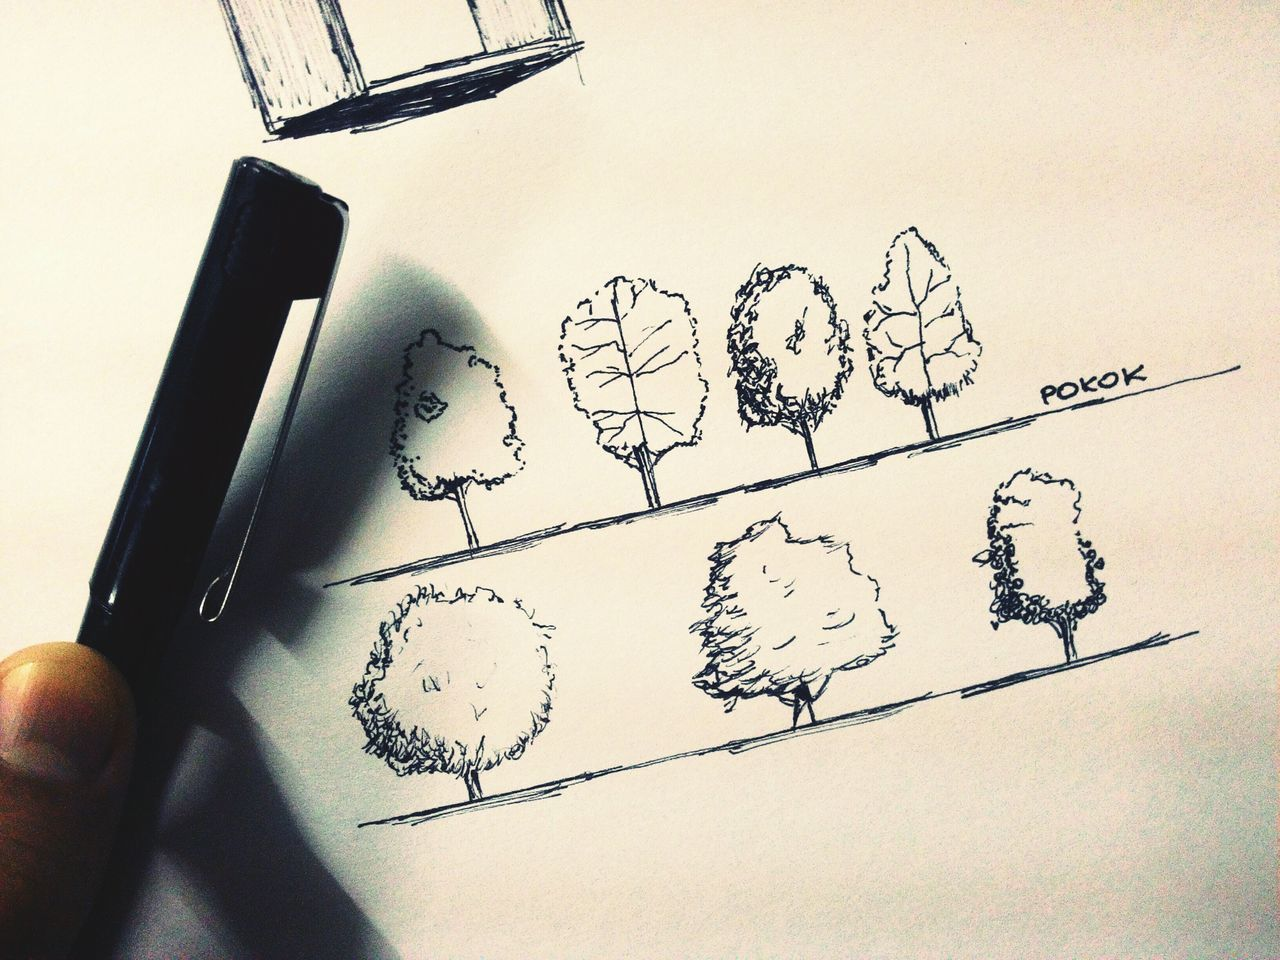 Angin kencang membawa kau..jauh ke sana..kau hilang terus tanpa khabar.. Architecture Sketch Trees Artline